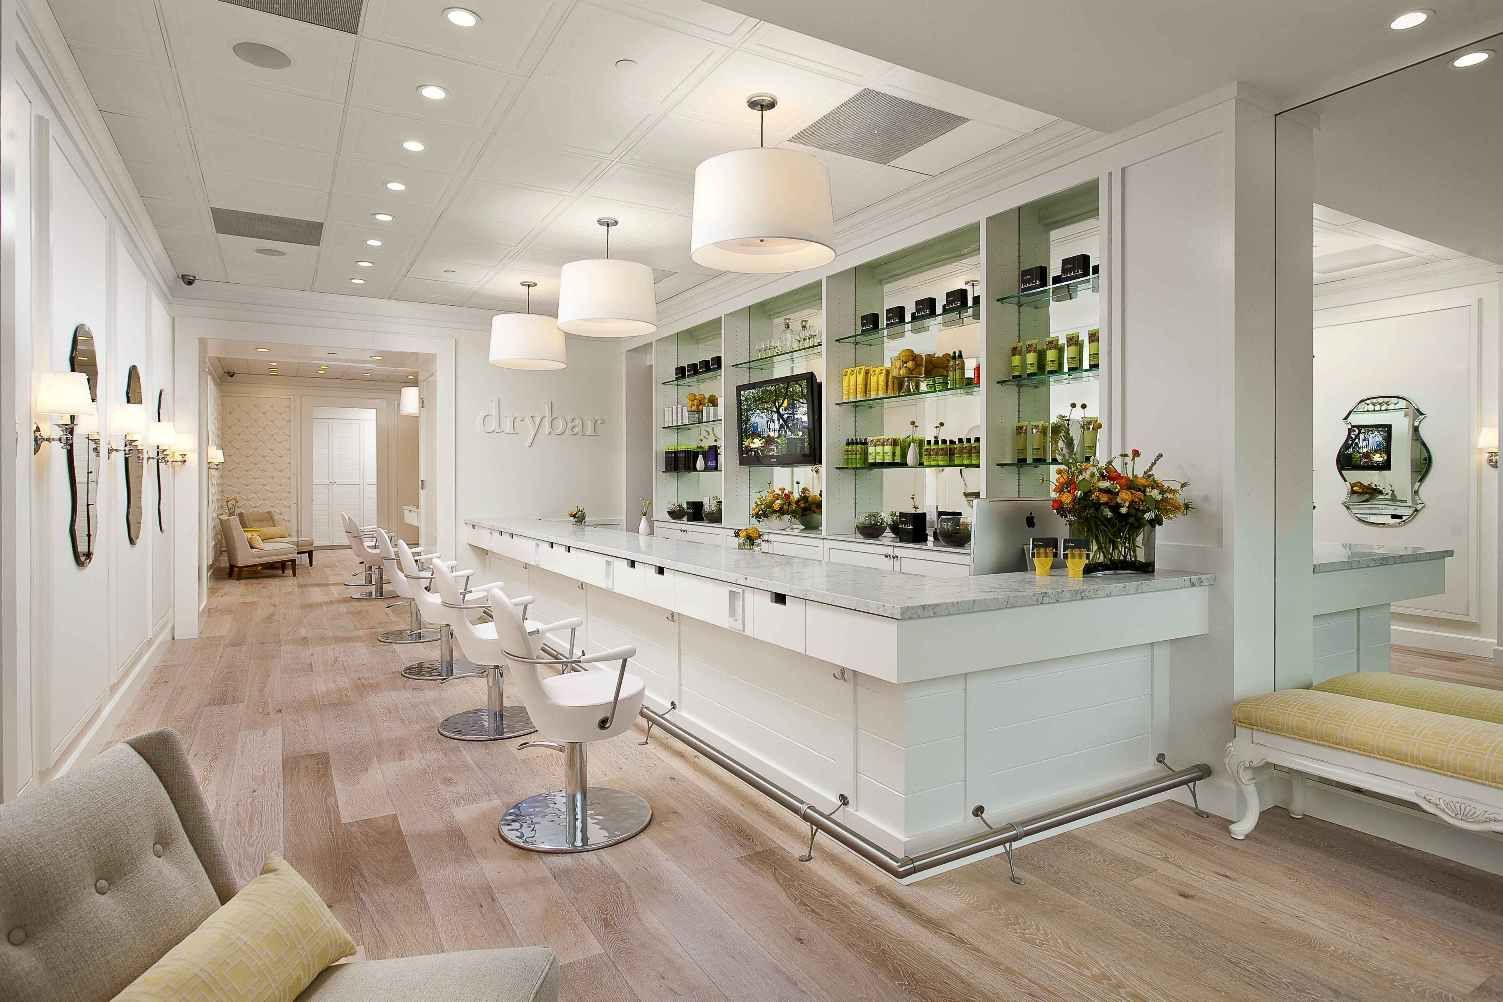 Salon Interior Design · Drybar Interior Shot ~ Crisp Decor